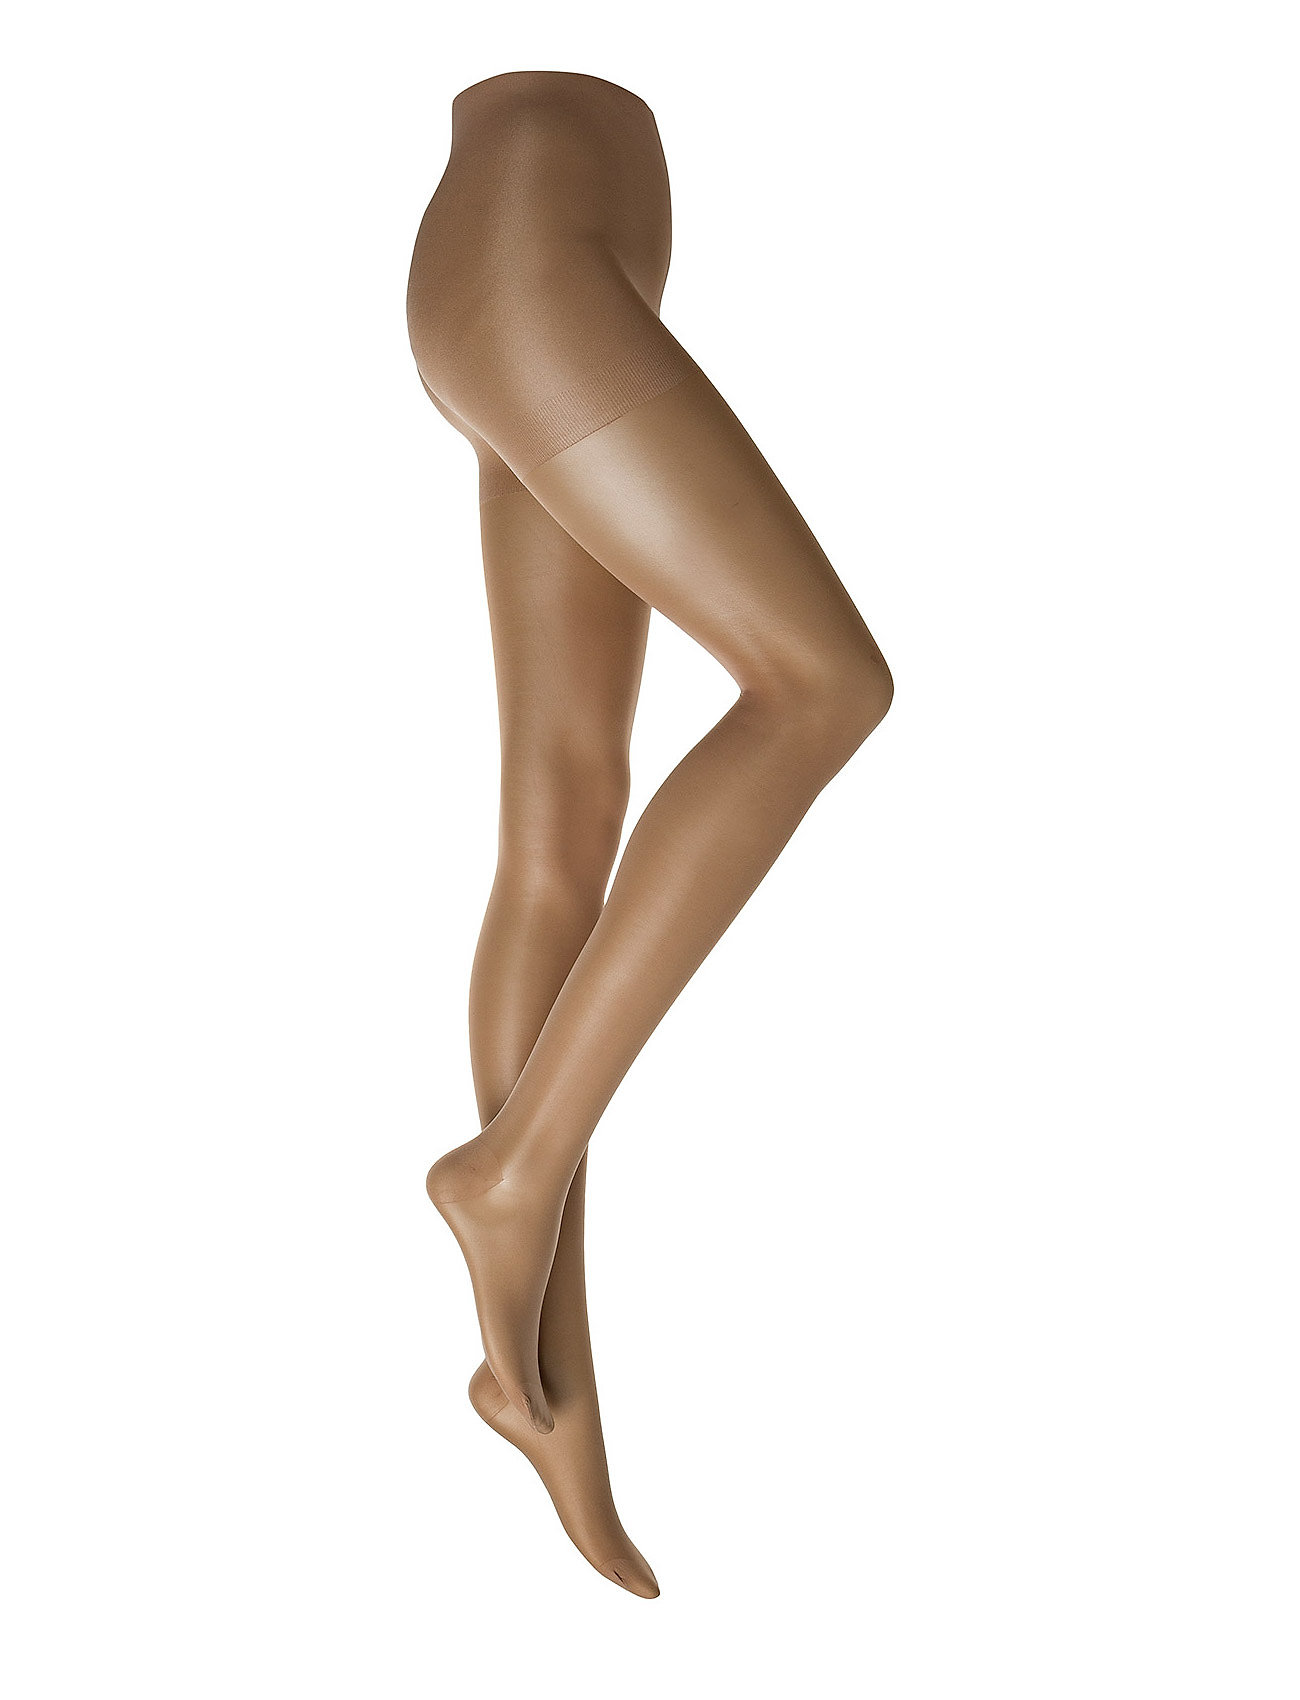 Vogue Ladies den pantyhose, Support 40den - SUNTAN